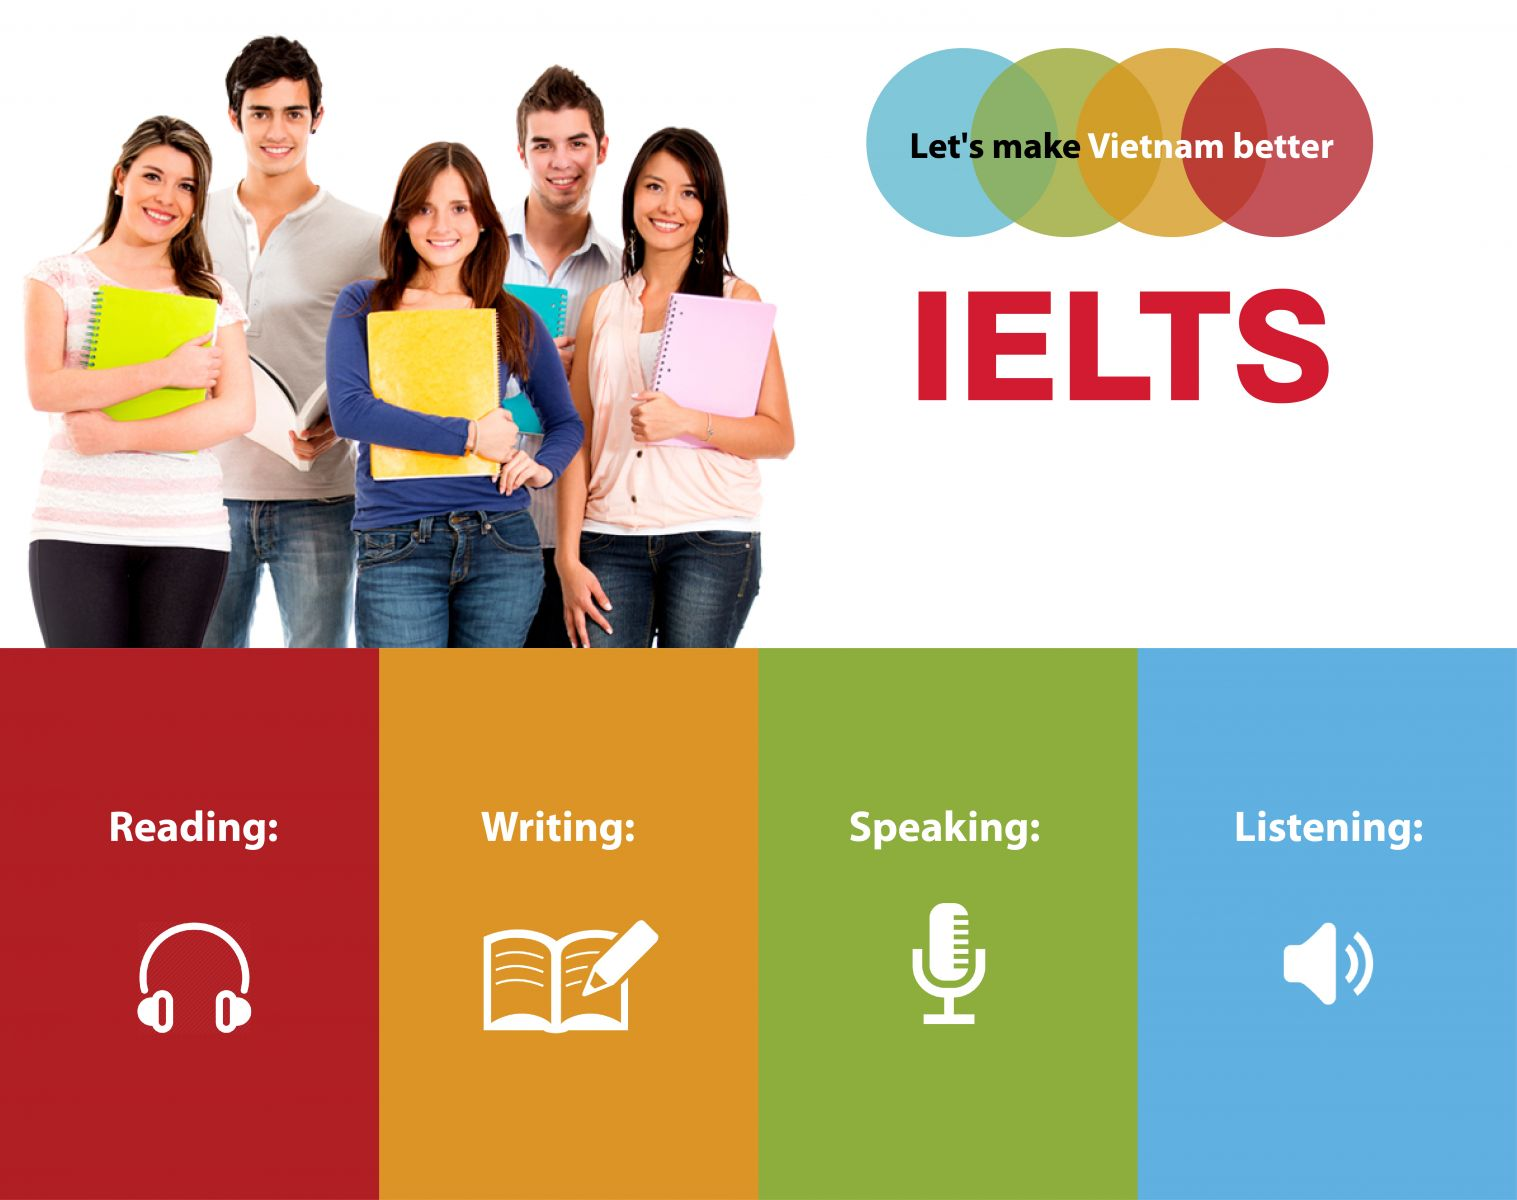 Du học Philippines luyện thi IELTS